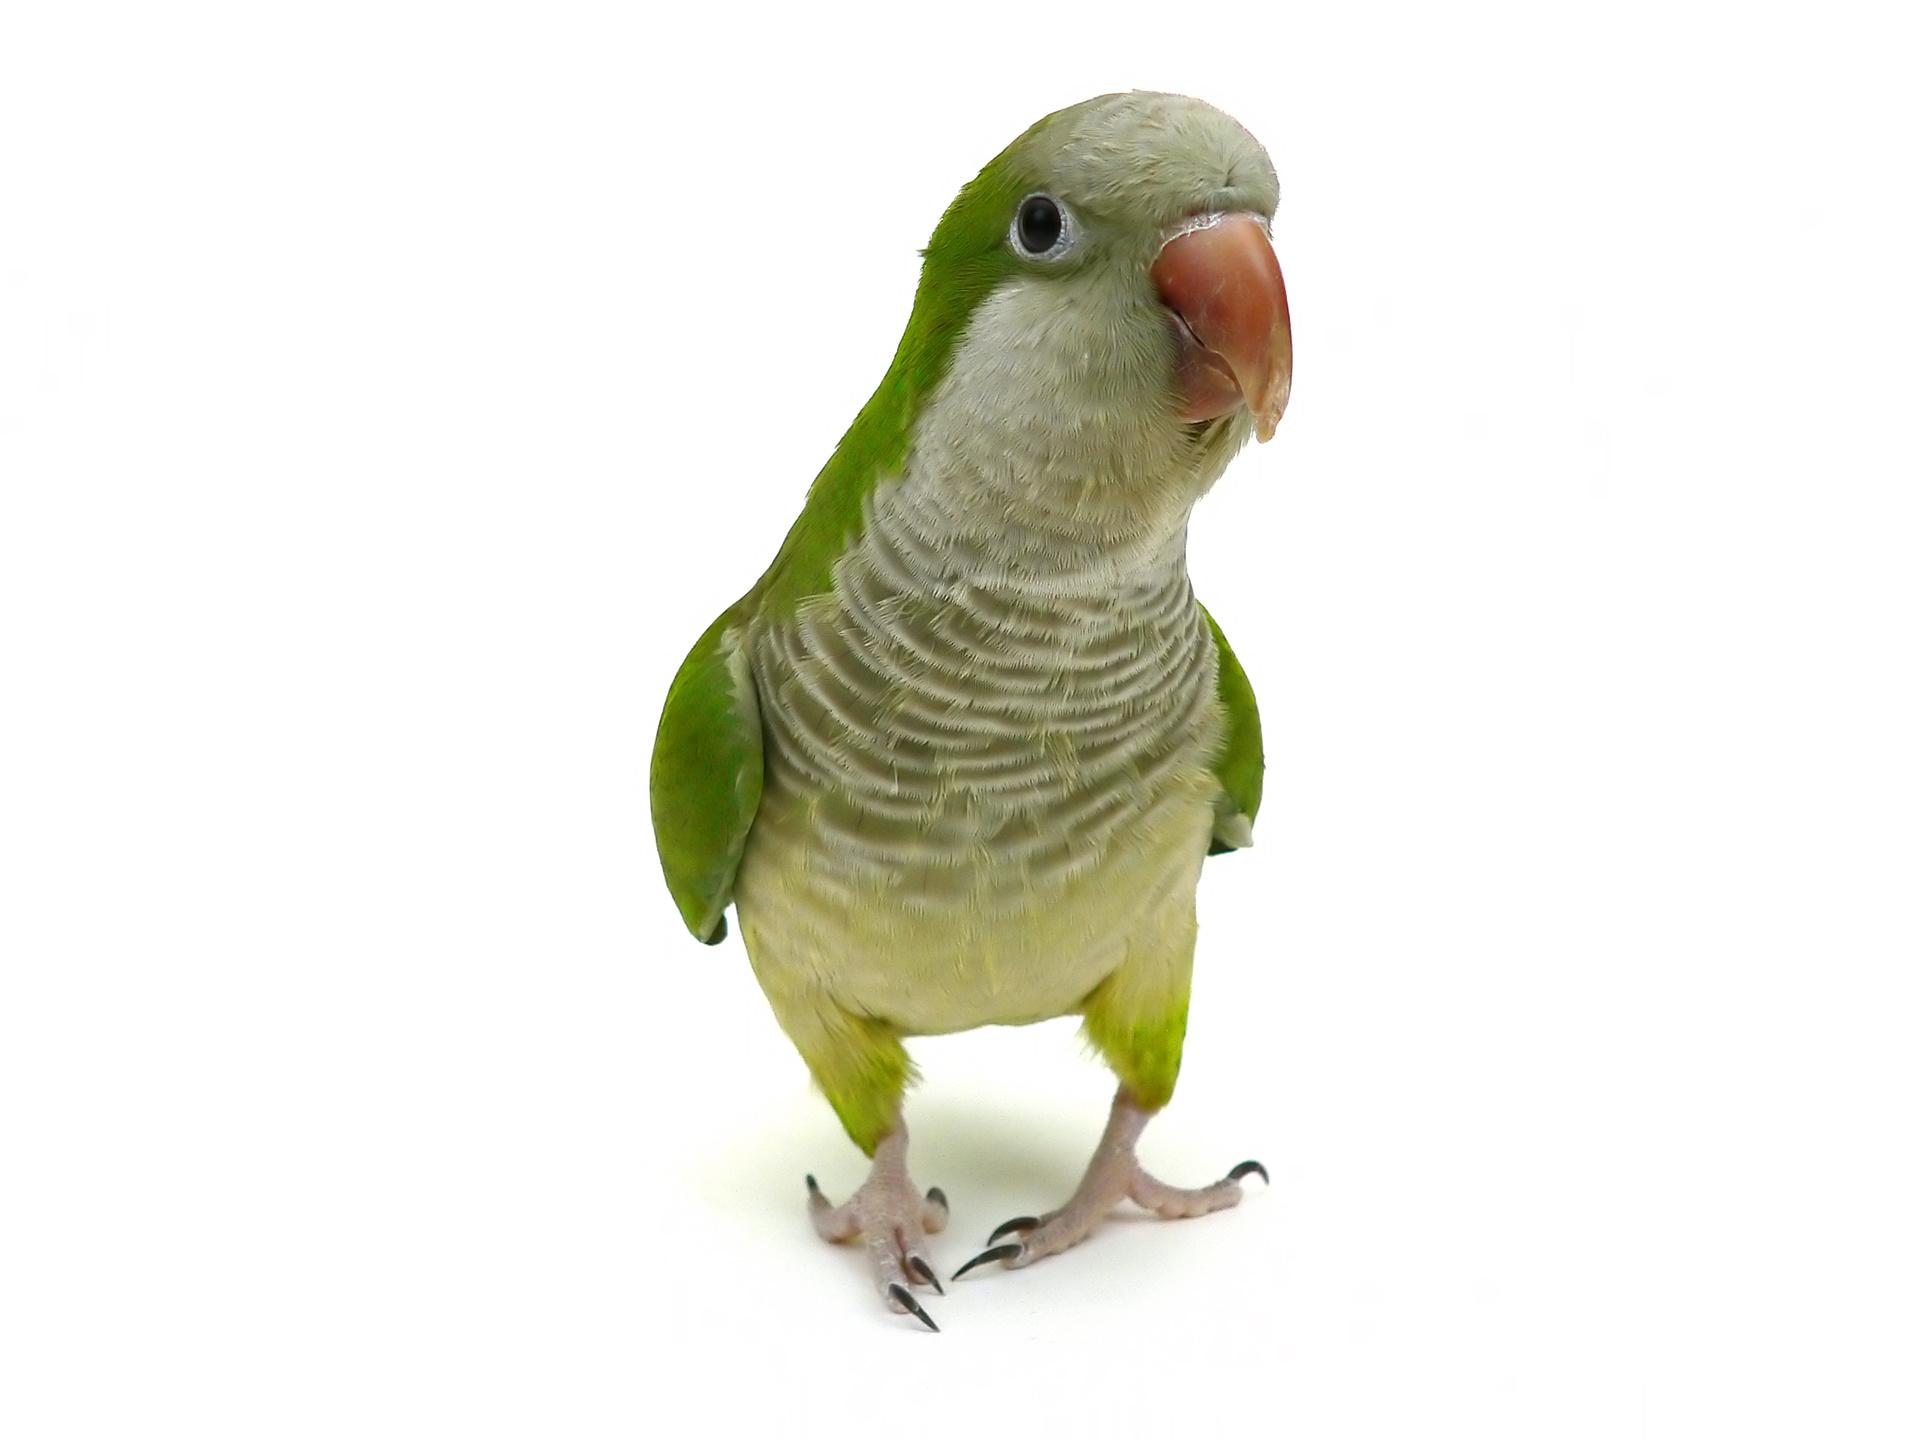 quaker parrot, pet parrot, pet bird, monk parakeet, monk parrot, exotic animals, exotic veterinarian, exotic vet, phoenix, arizona, avian and exotic animal clinic, exotic animal hospital, exotic animal clinic